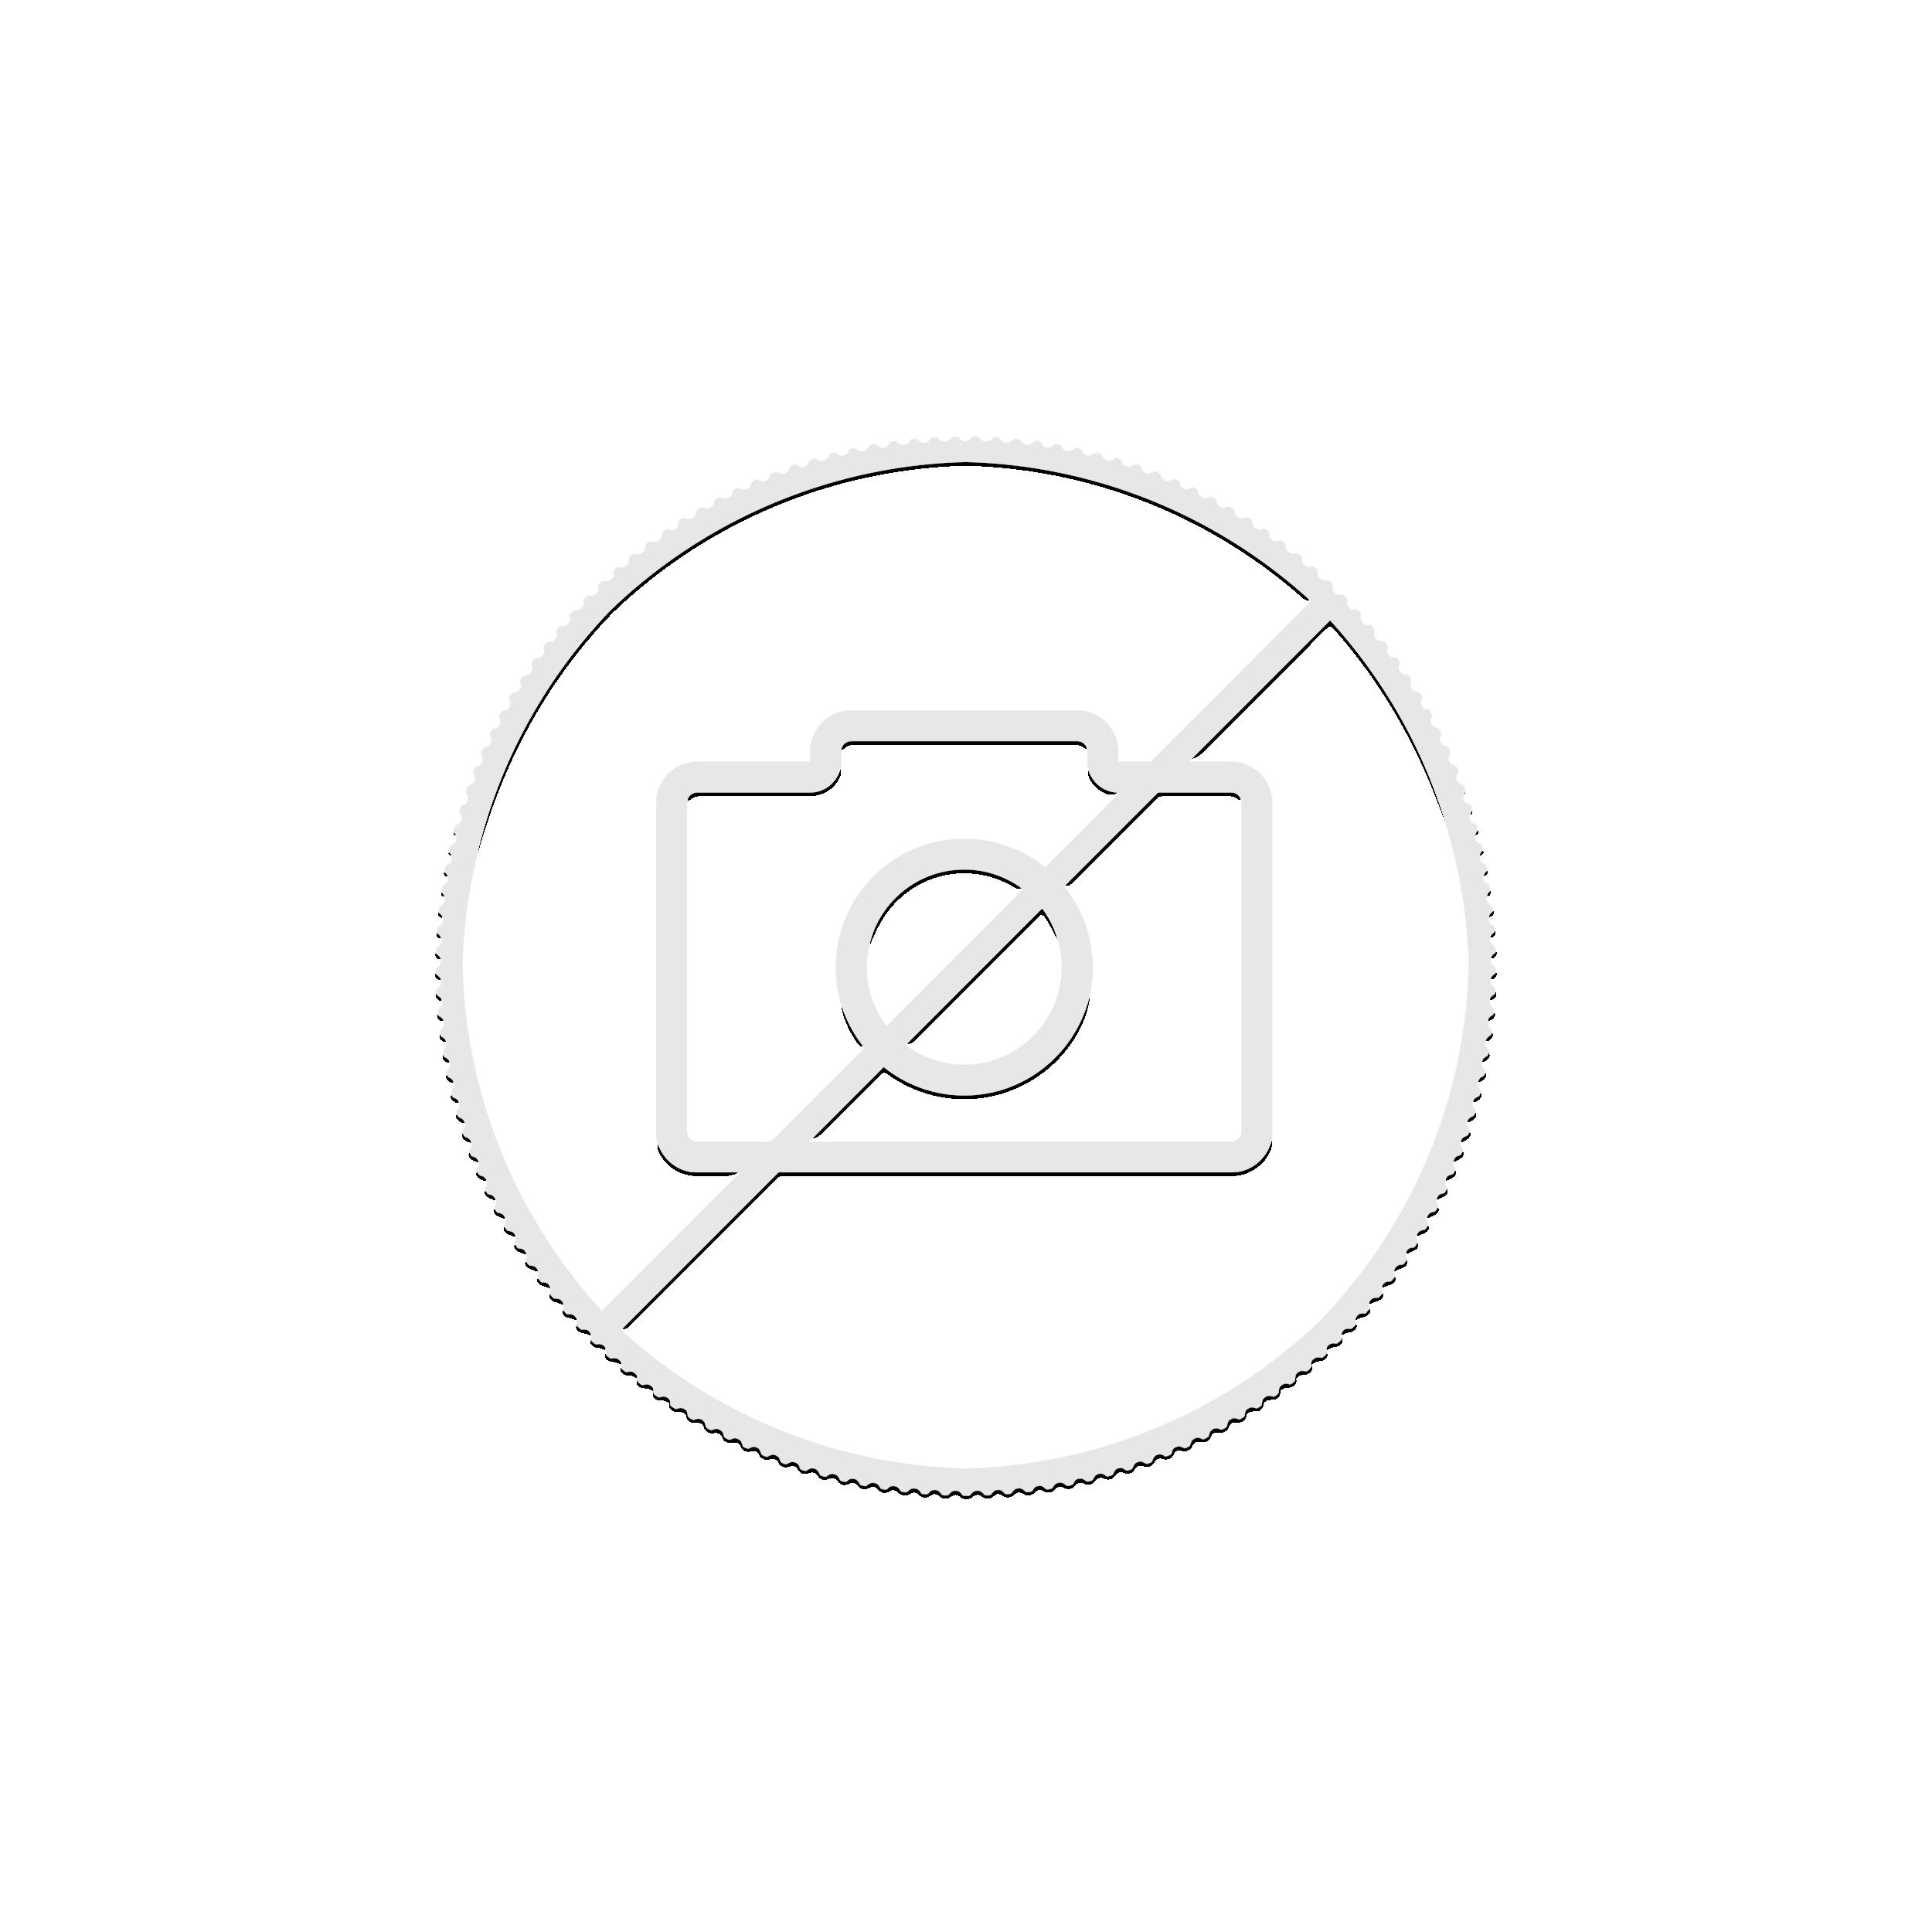 1 Troy ounce silver coin Lunar 2021 Proof